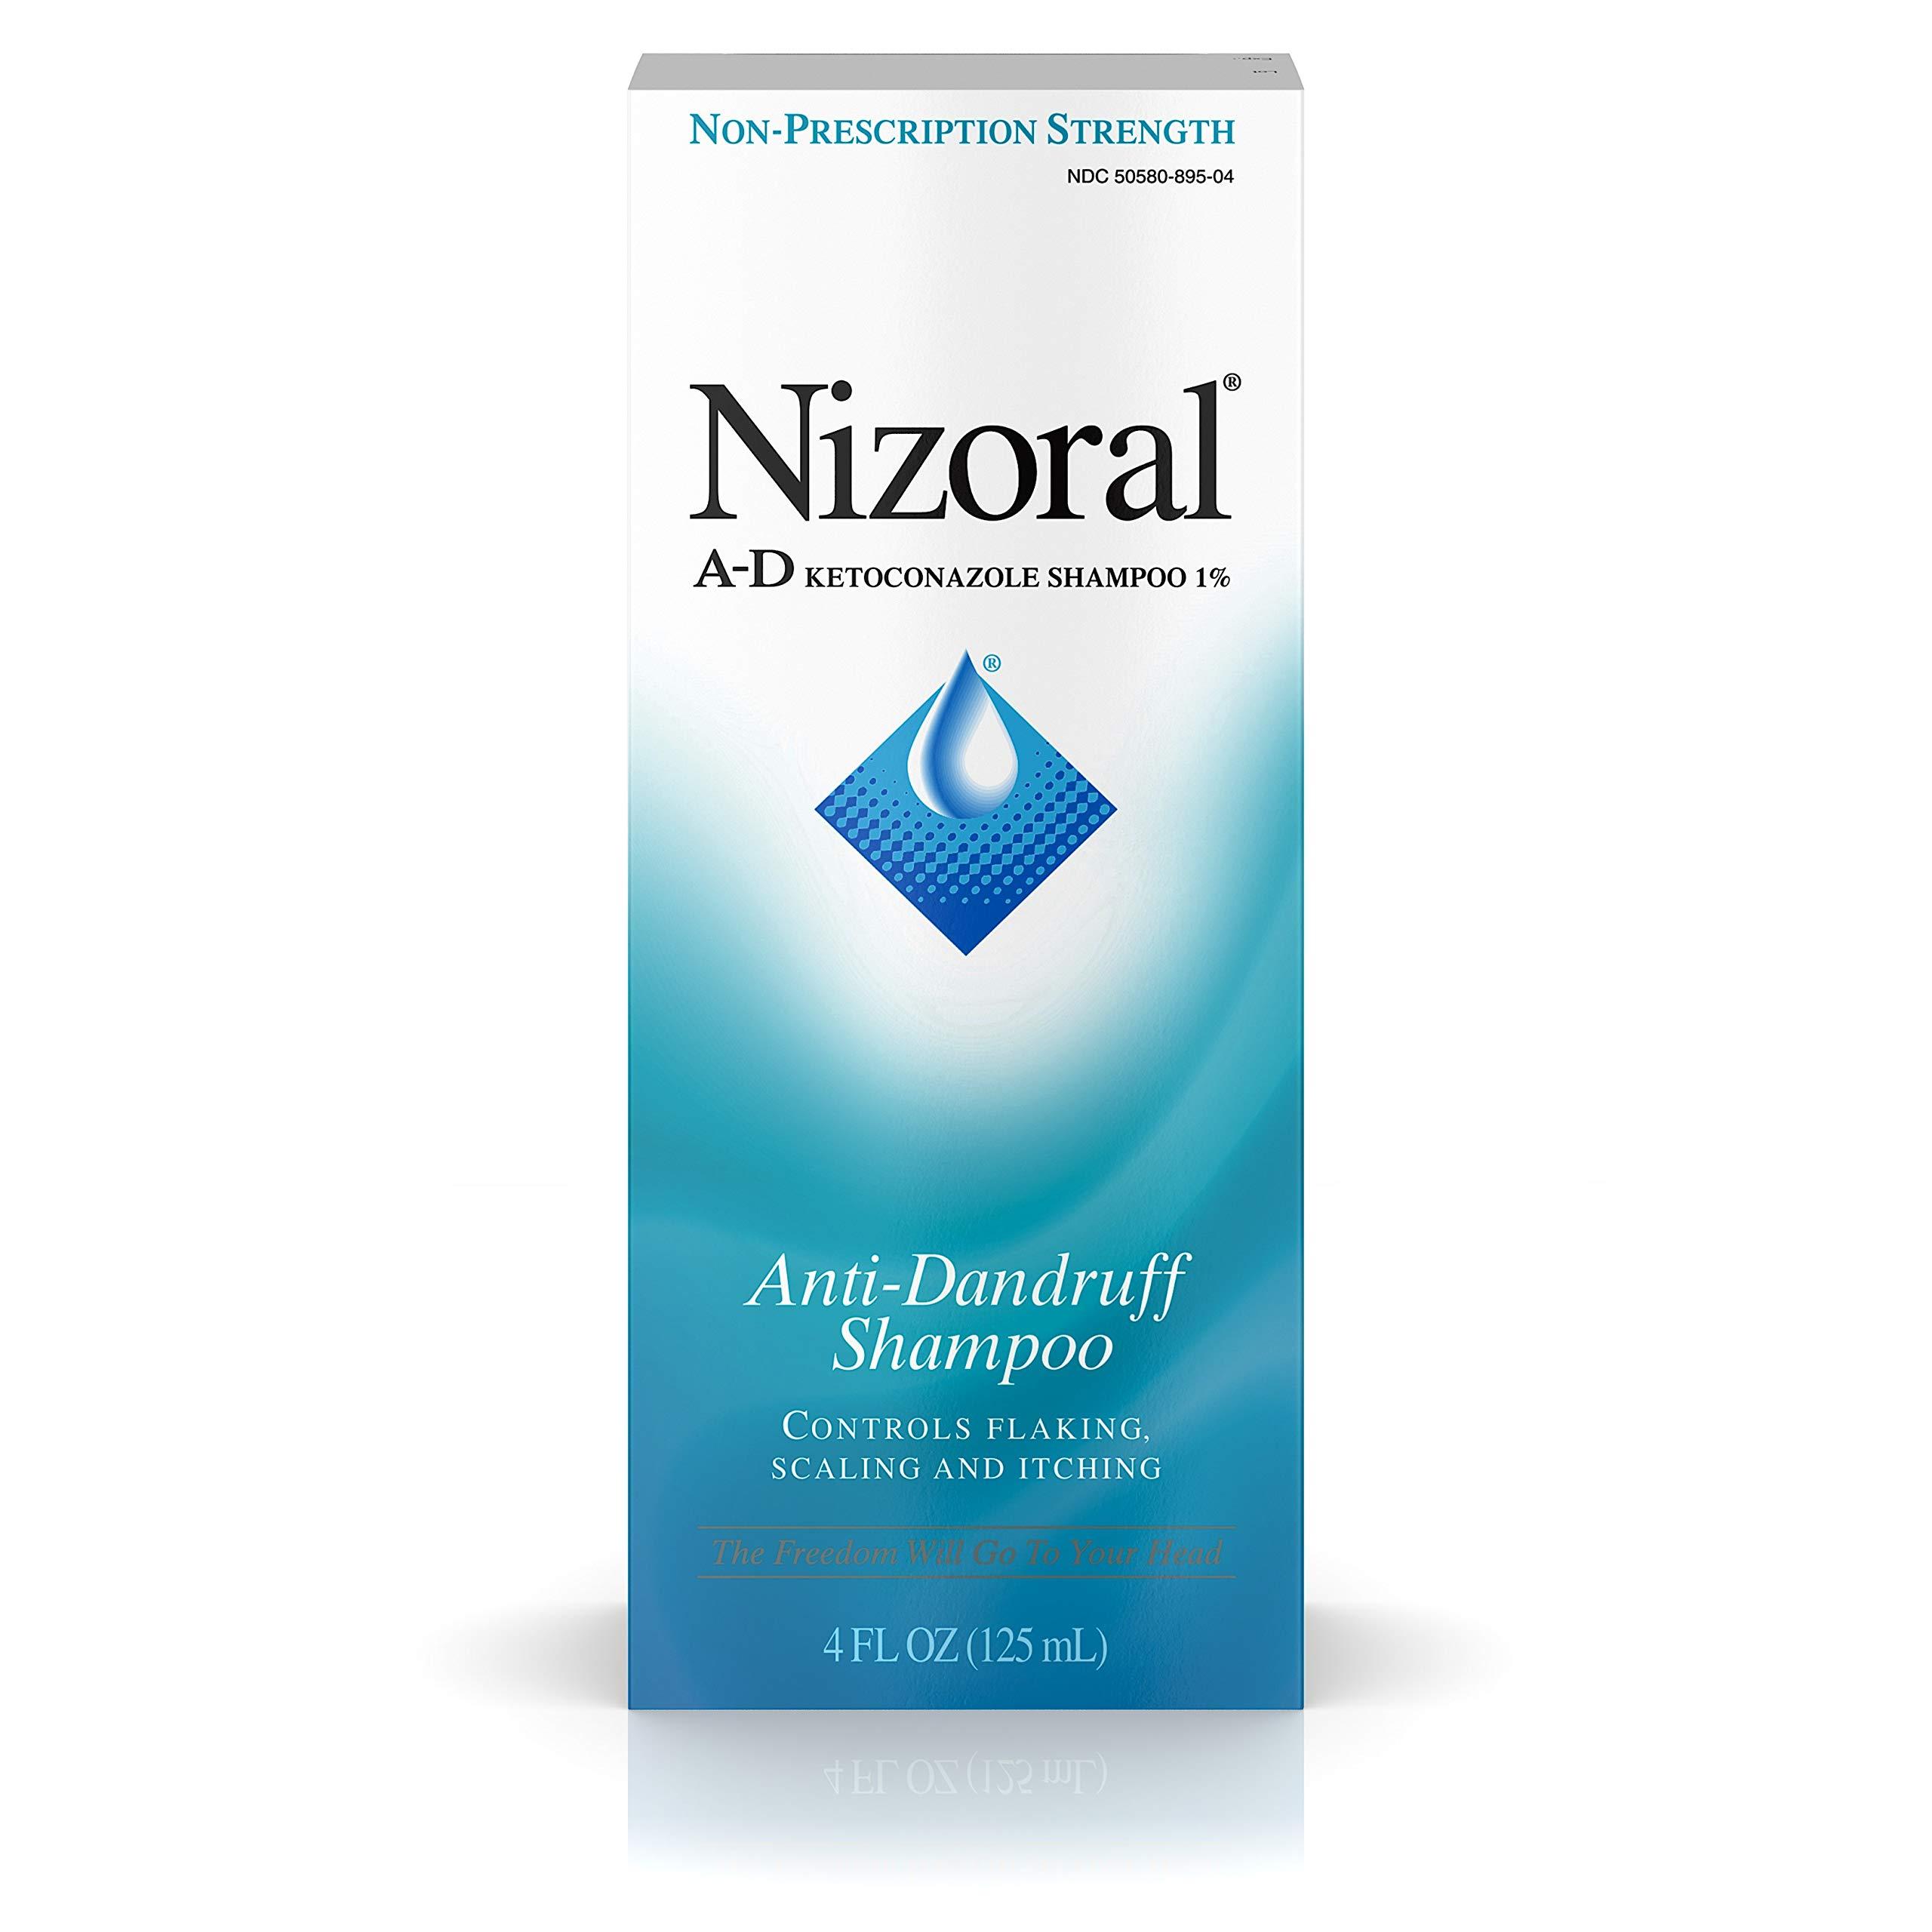 Nizoral A-D Anti-Dandruff Shampoo 4 fl. oz by Nizoral